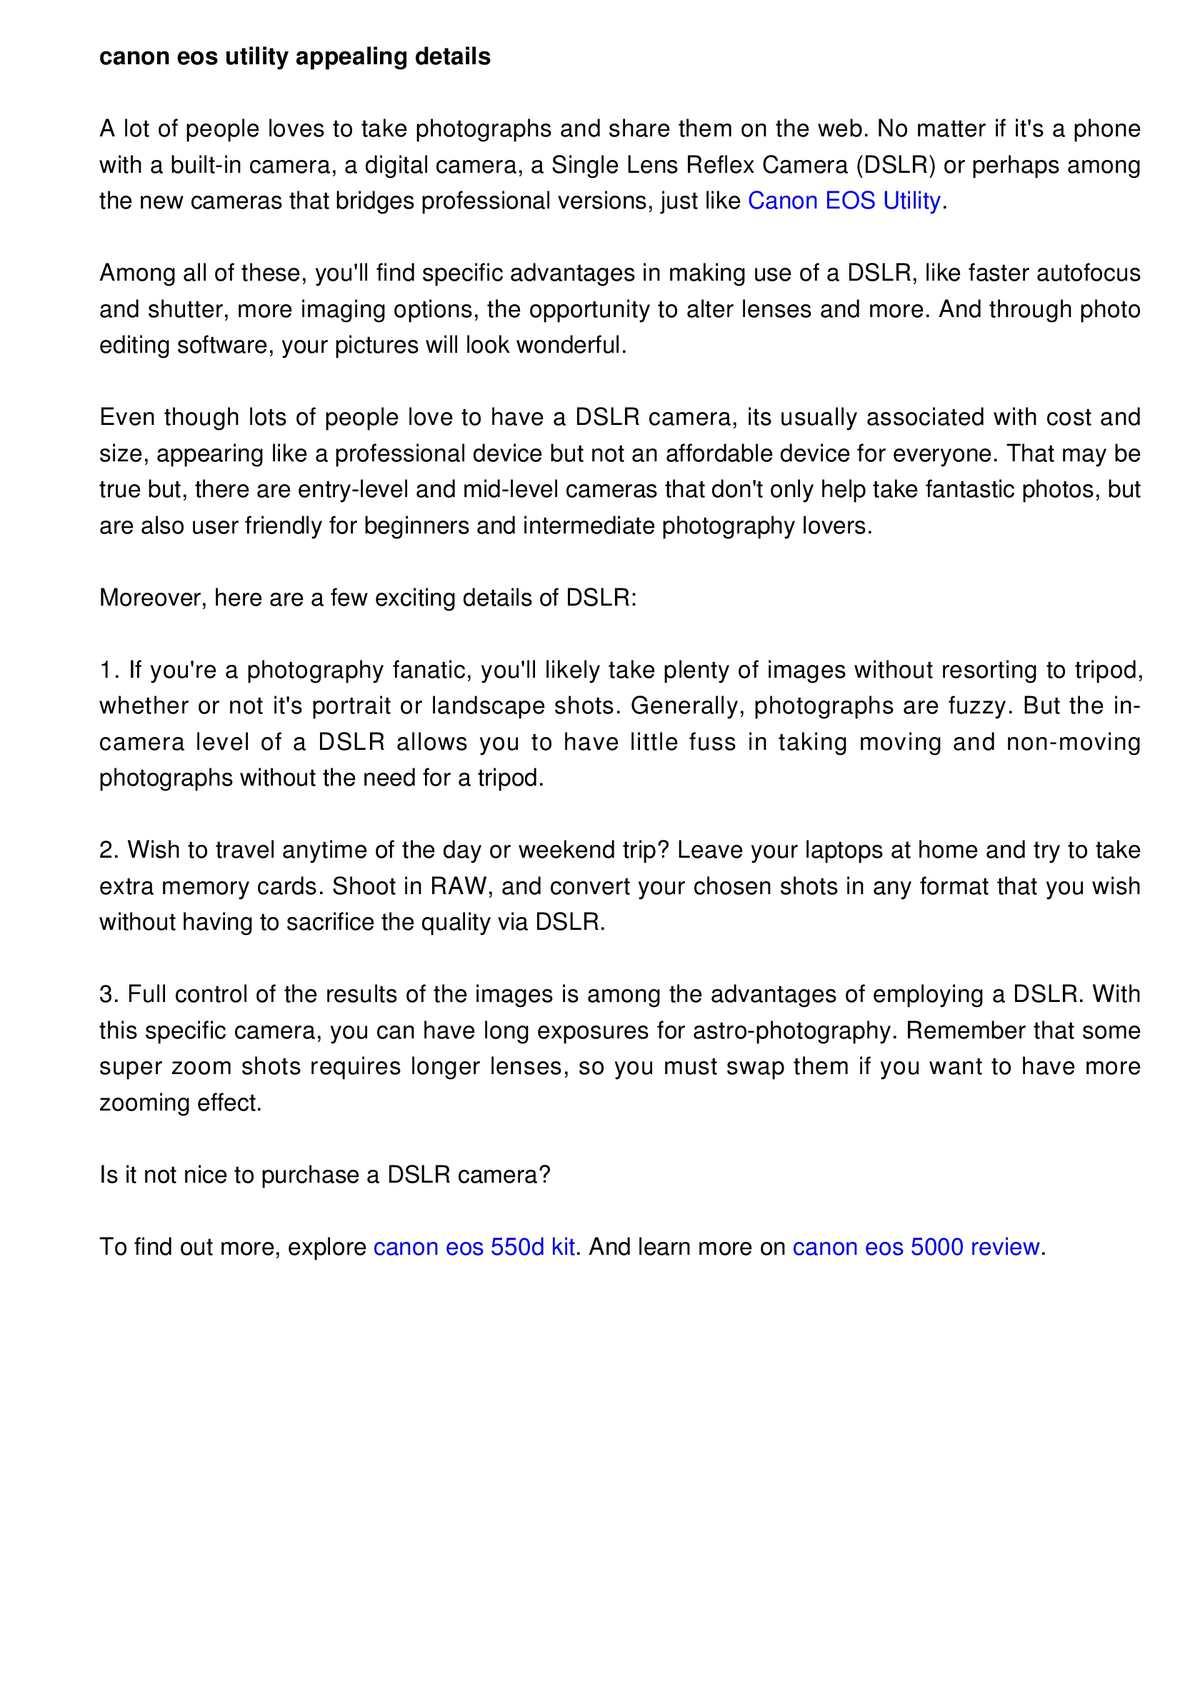 Calaméo - Canon EOS Utility: Attention-grabbing info of a DSLR